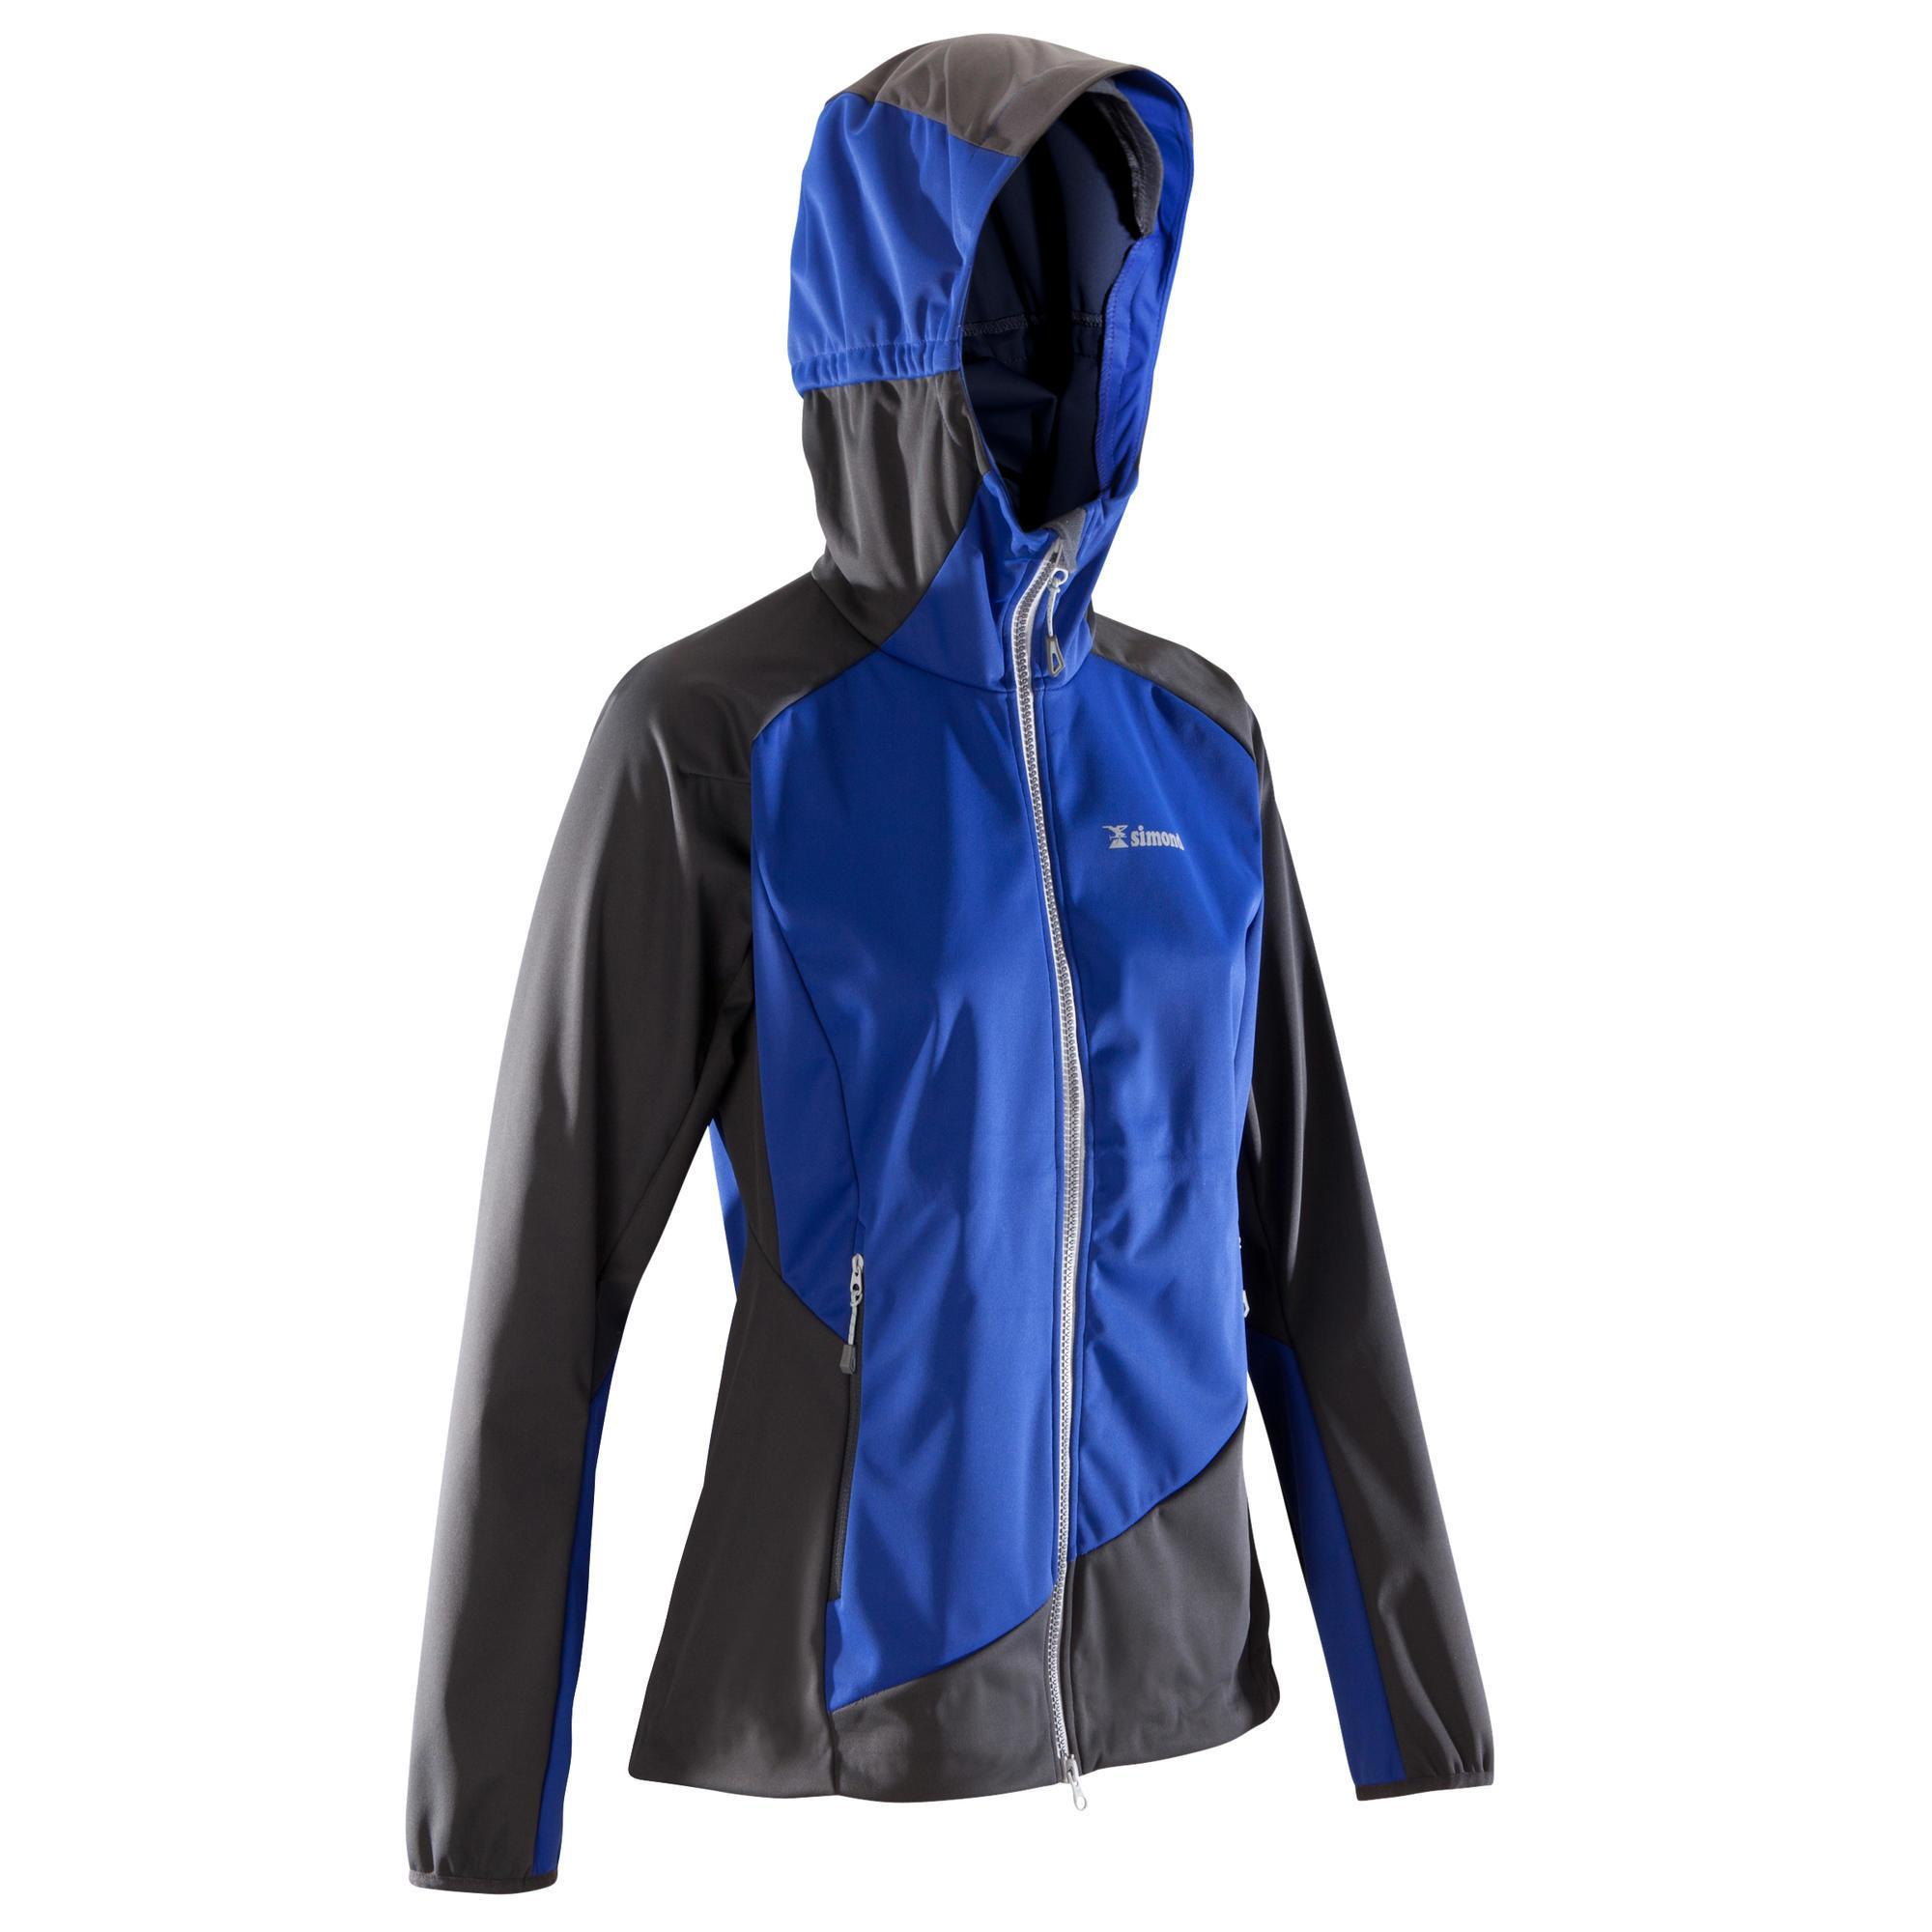 Simond Dames softshell jas Light voor alpinisme donkerindigo en grijs